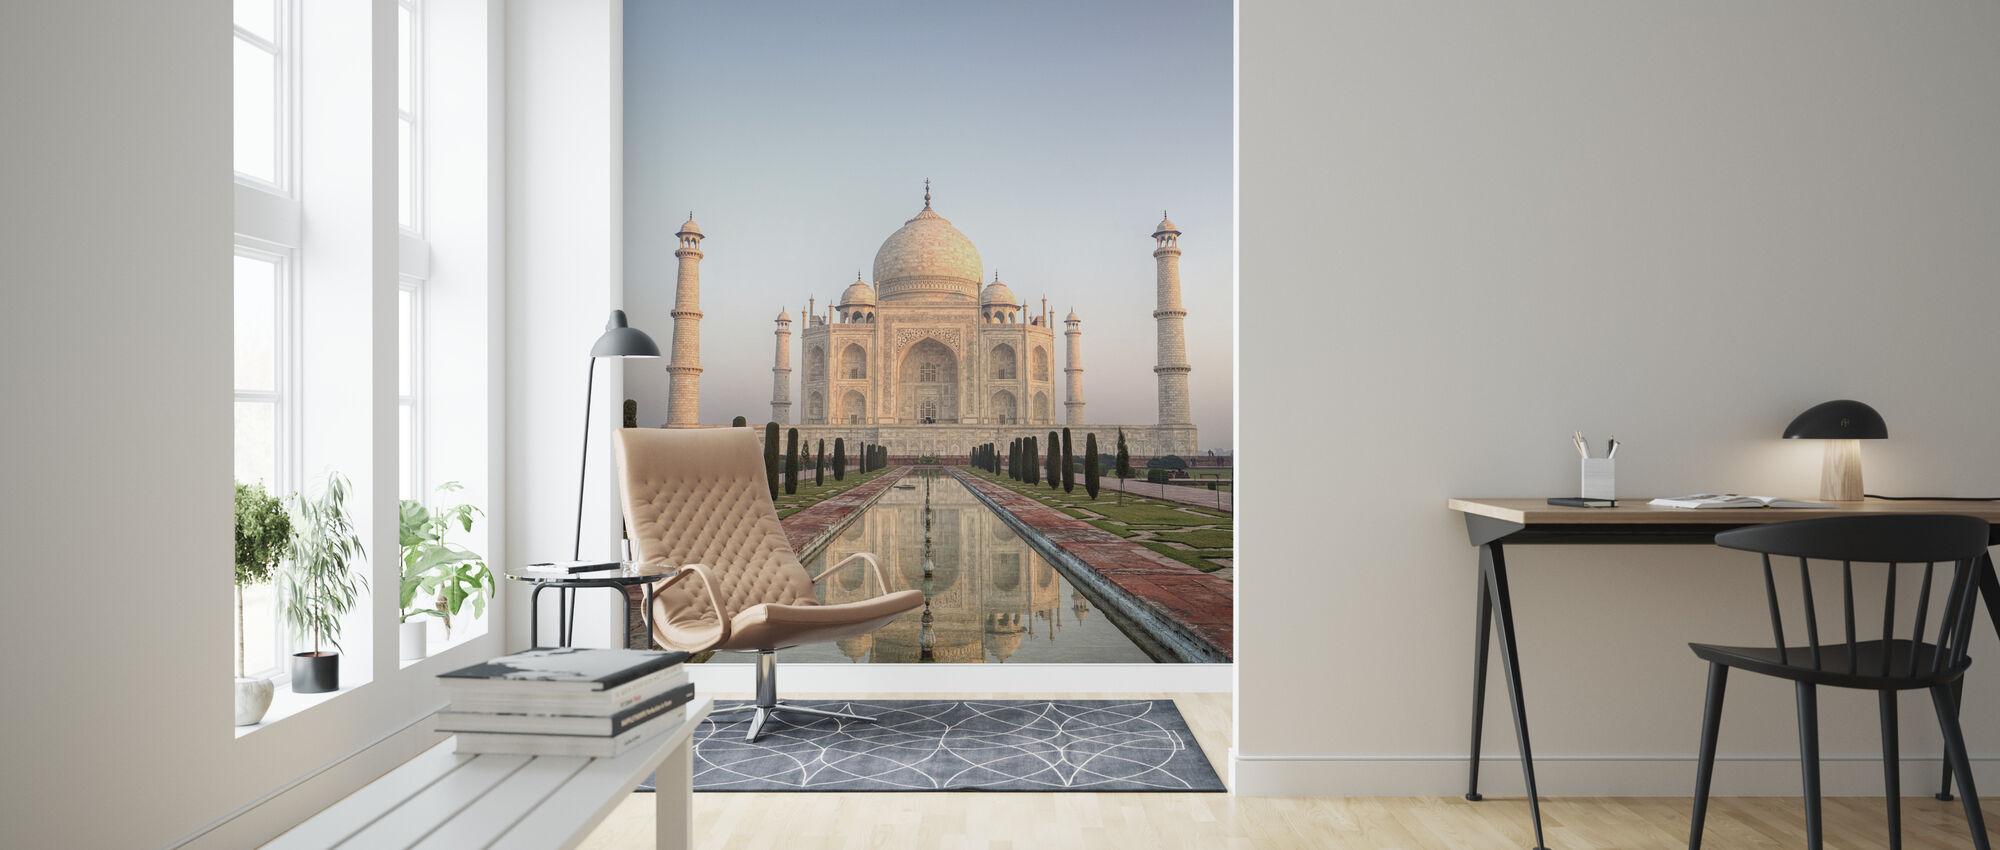 Sunrise at Taj Mahal - Wallpaper - Living Room